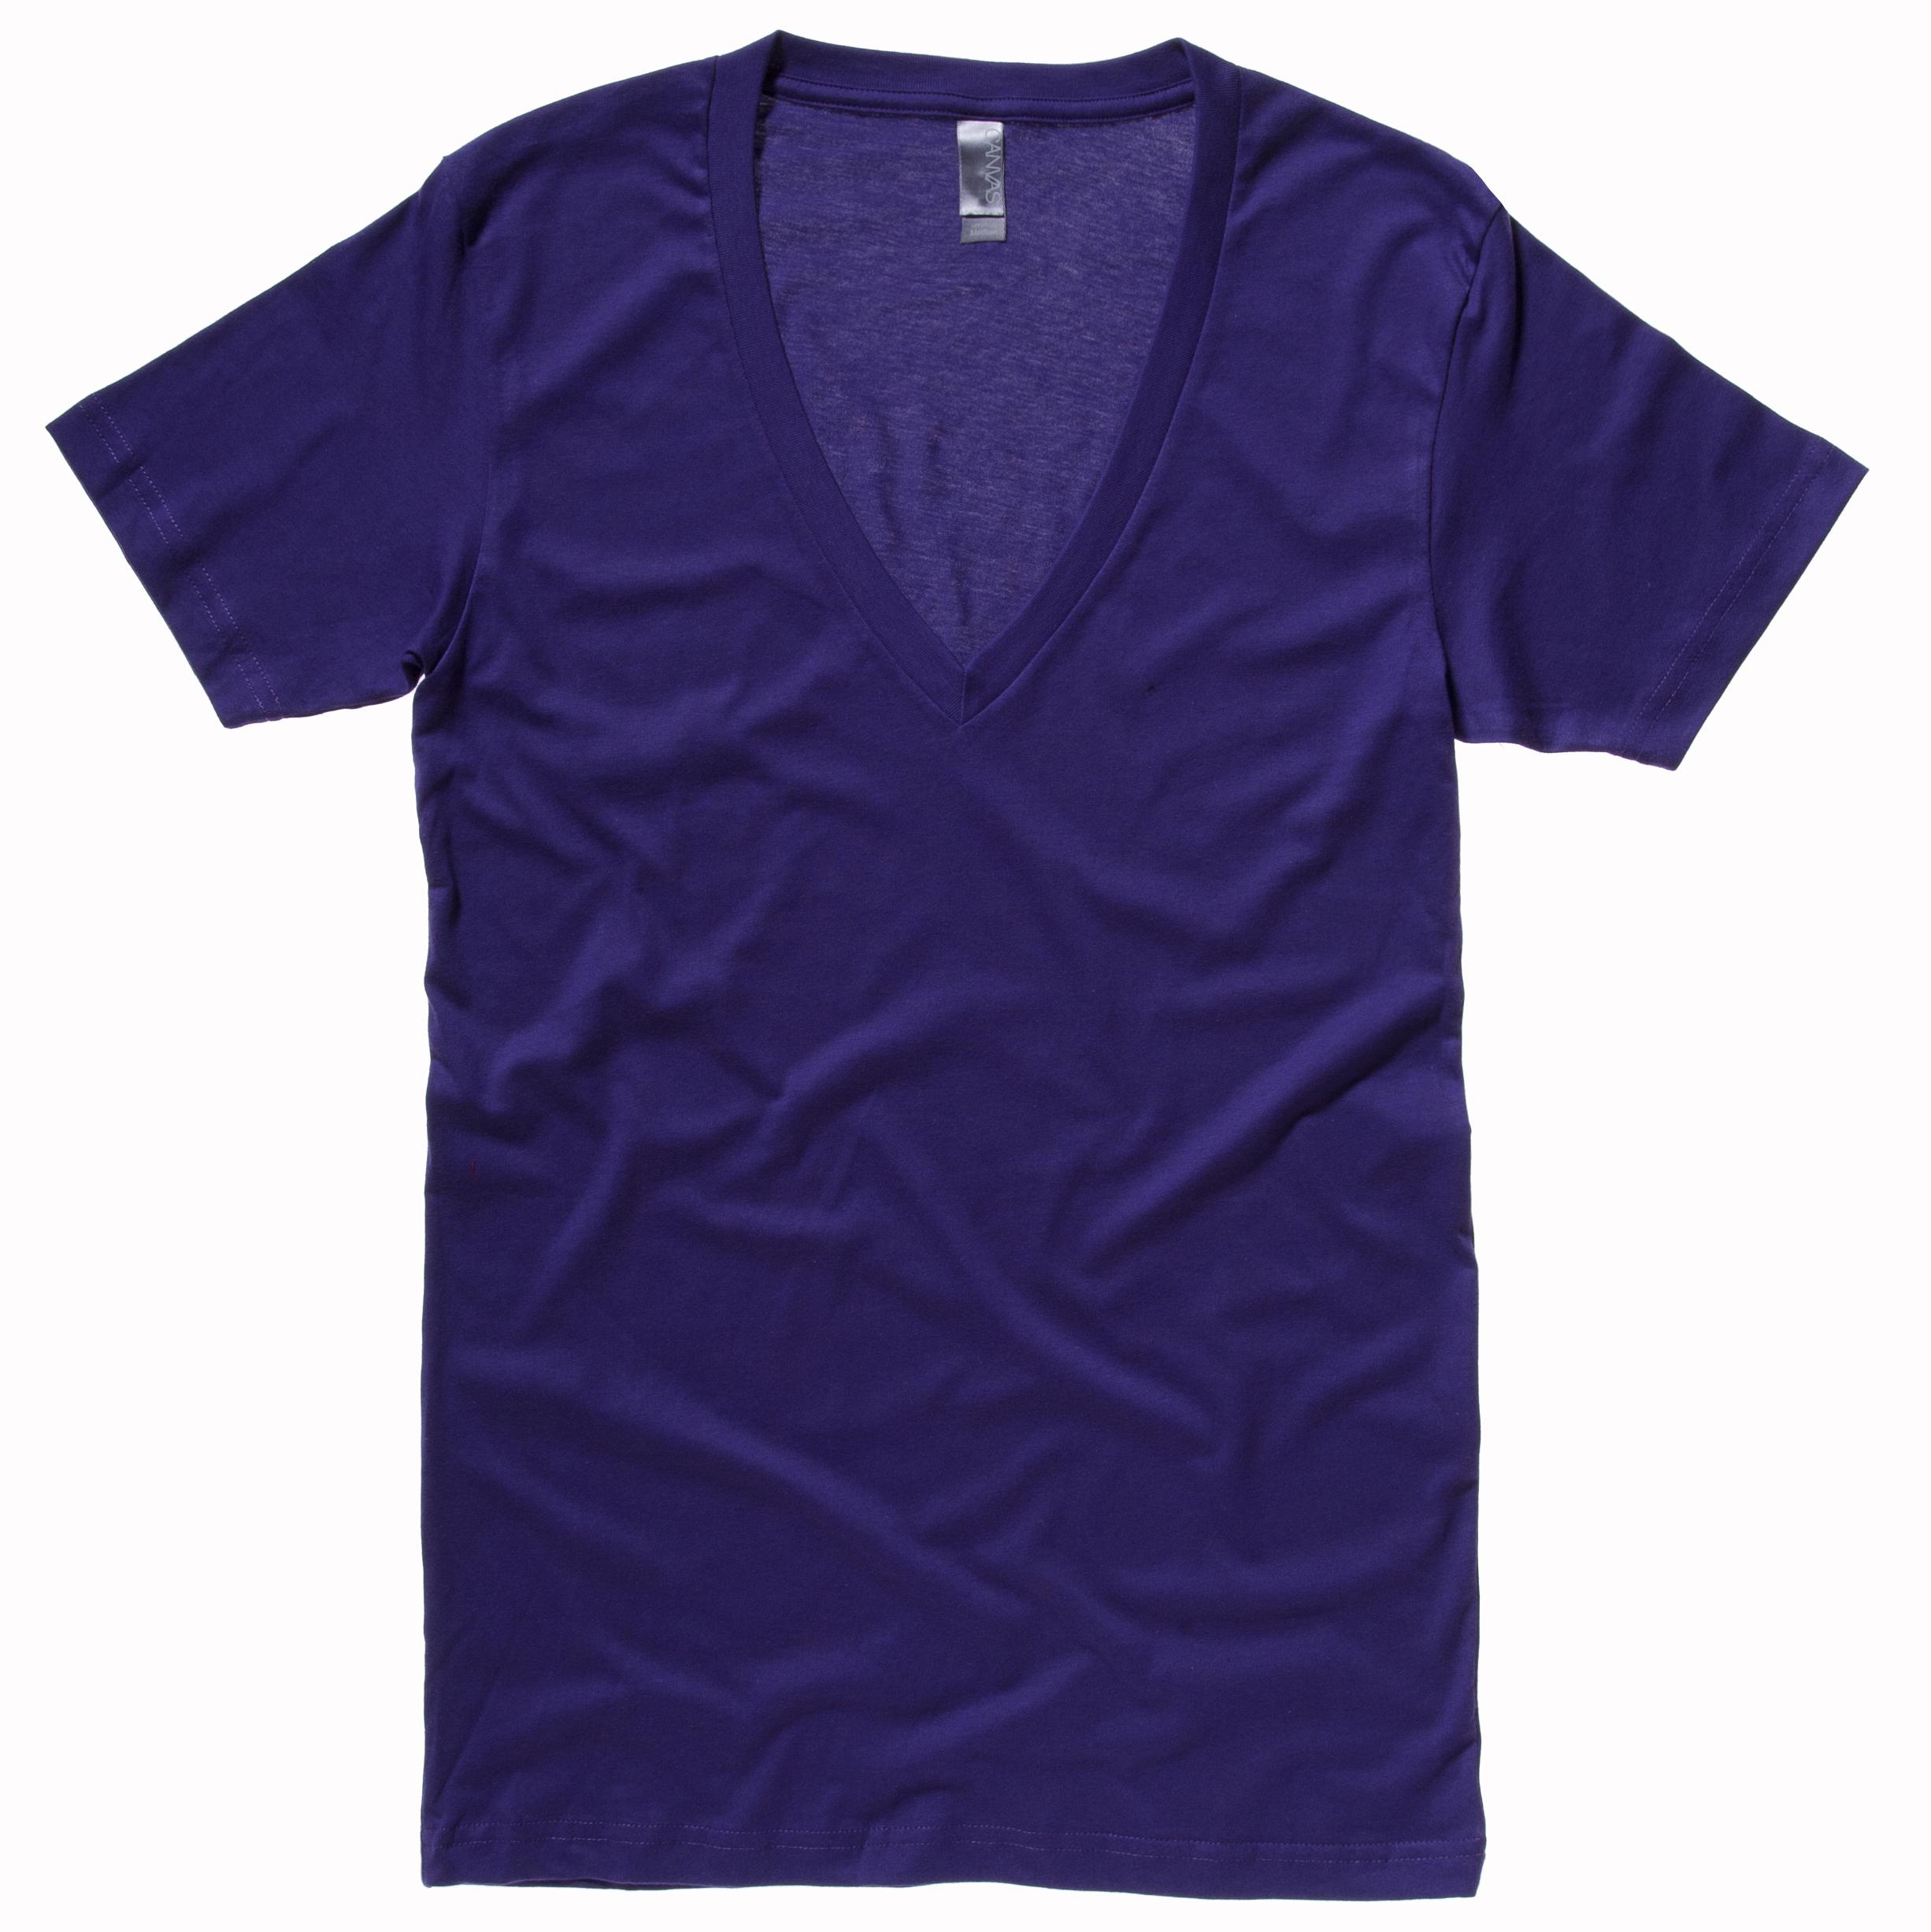 New-BELLA-CANVAS-Unisex-Cotton-Jersey-Deep-V-Neck-T-Shirt-in-3-Colours-S-XXL